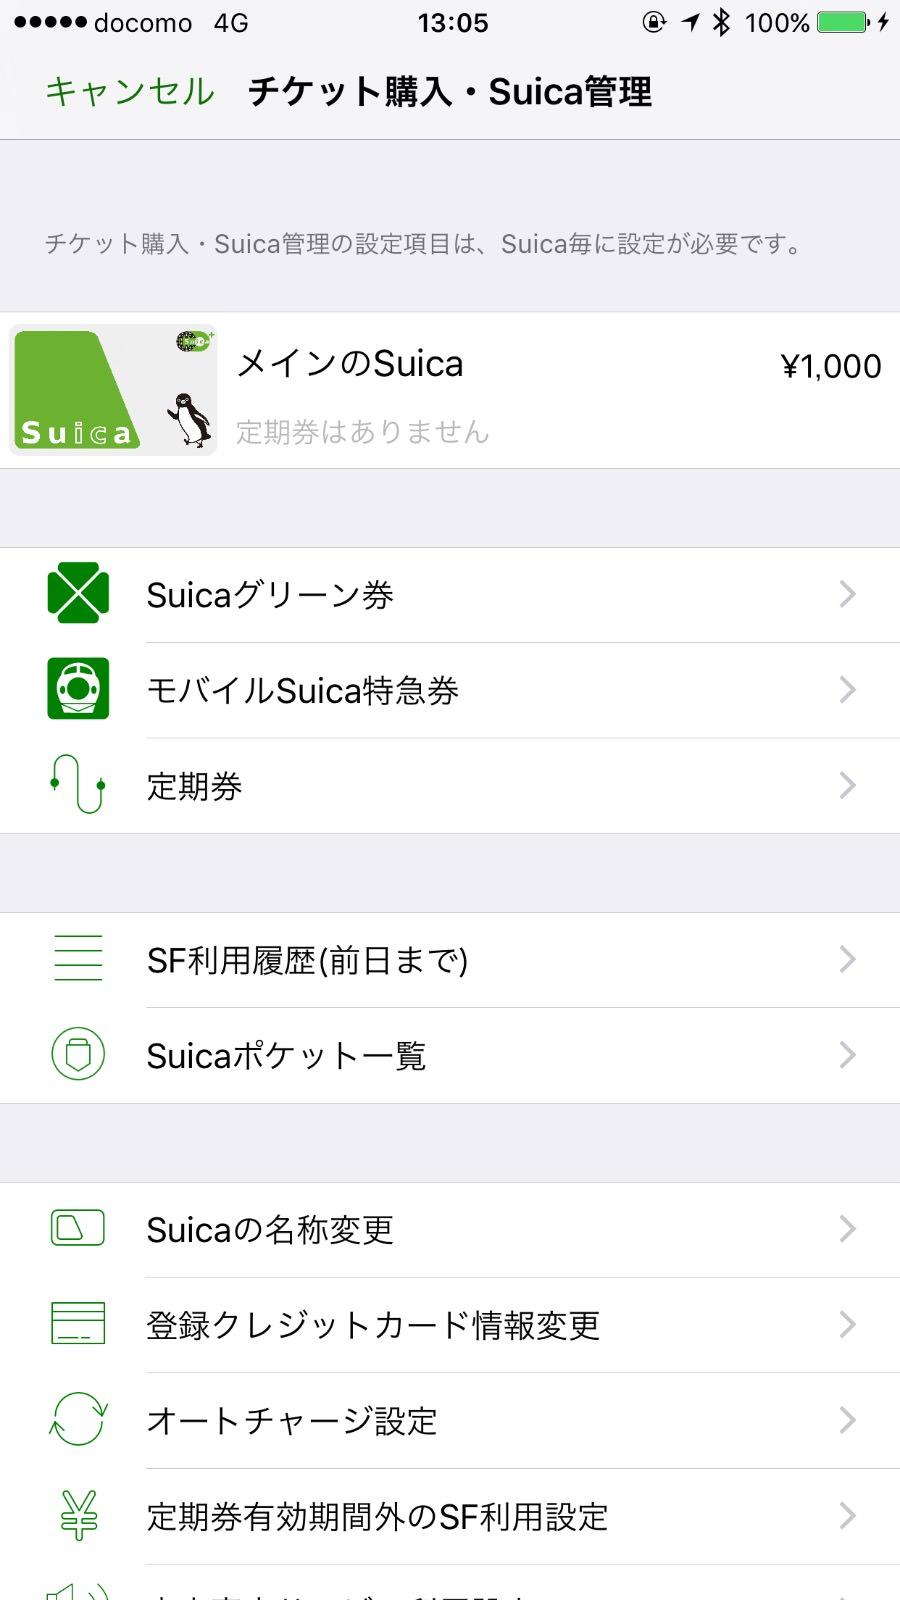 Mobile suica 0232